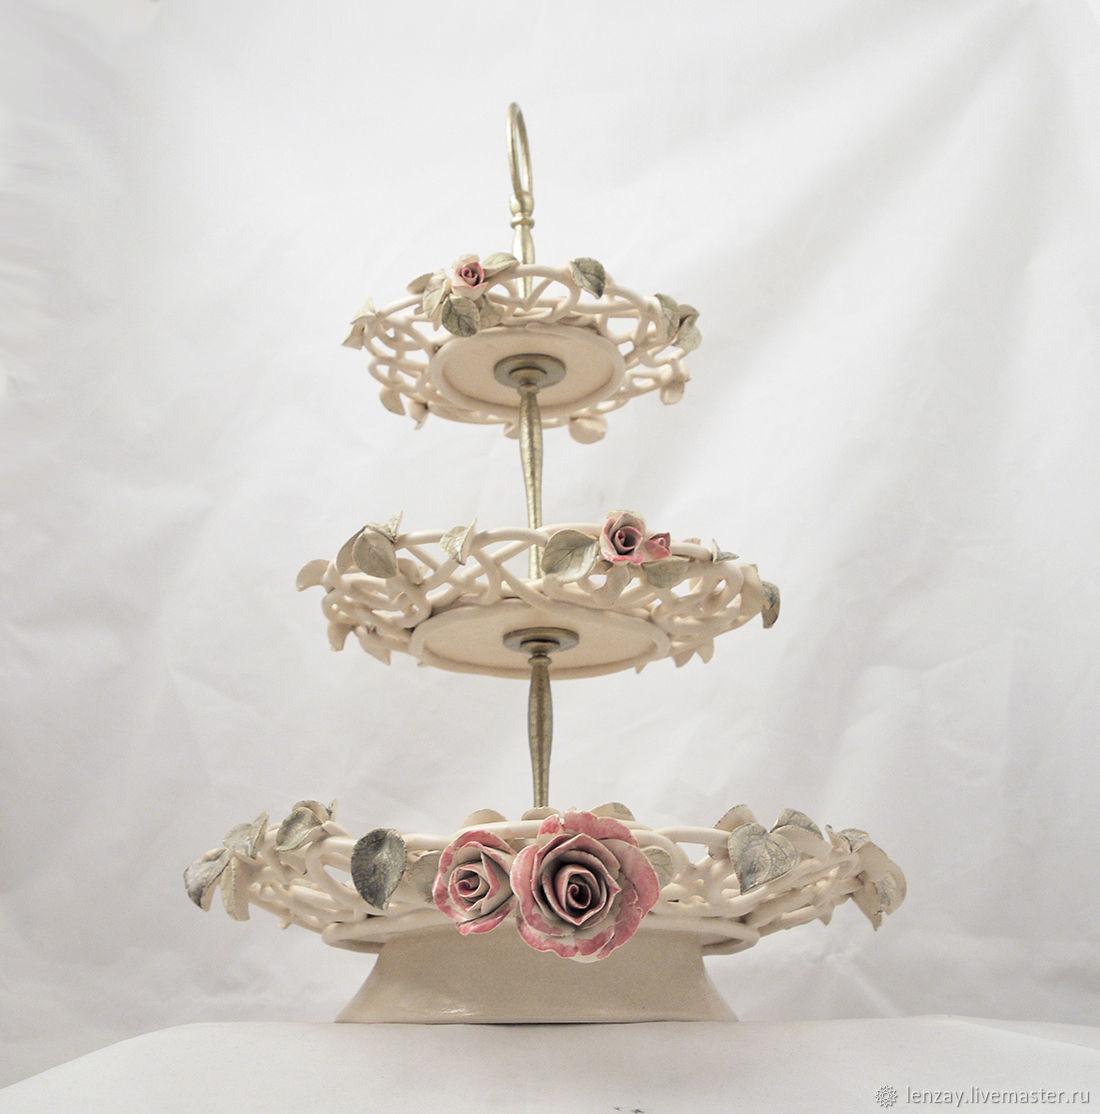 The bottom `Transparency` 3-tier. Braided ceramic and ceramic flowers Elena Zaichenko